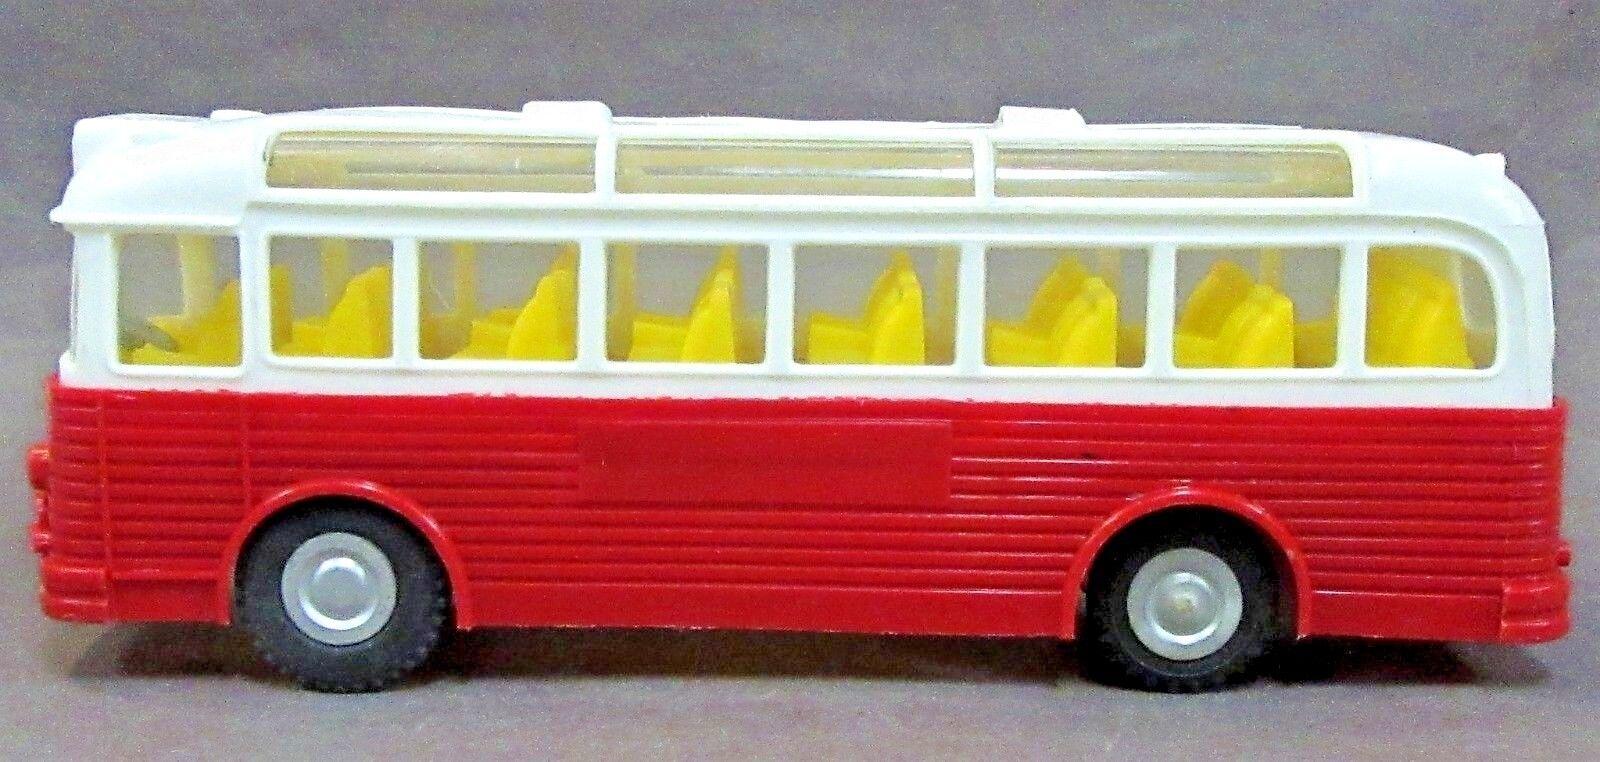 Scarce 1960's MAK'S BUS Hong Kong large 10  long friction drive plastic